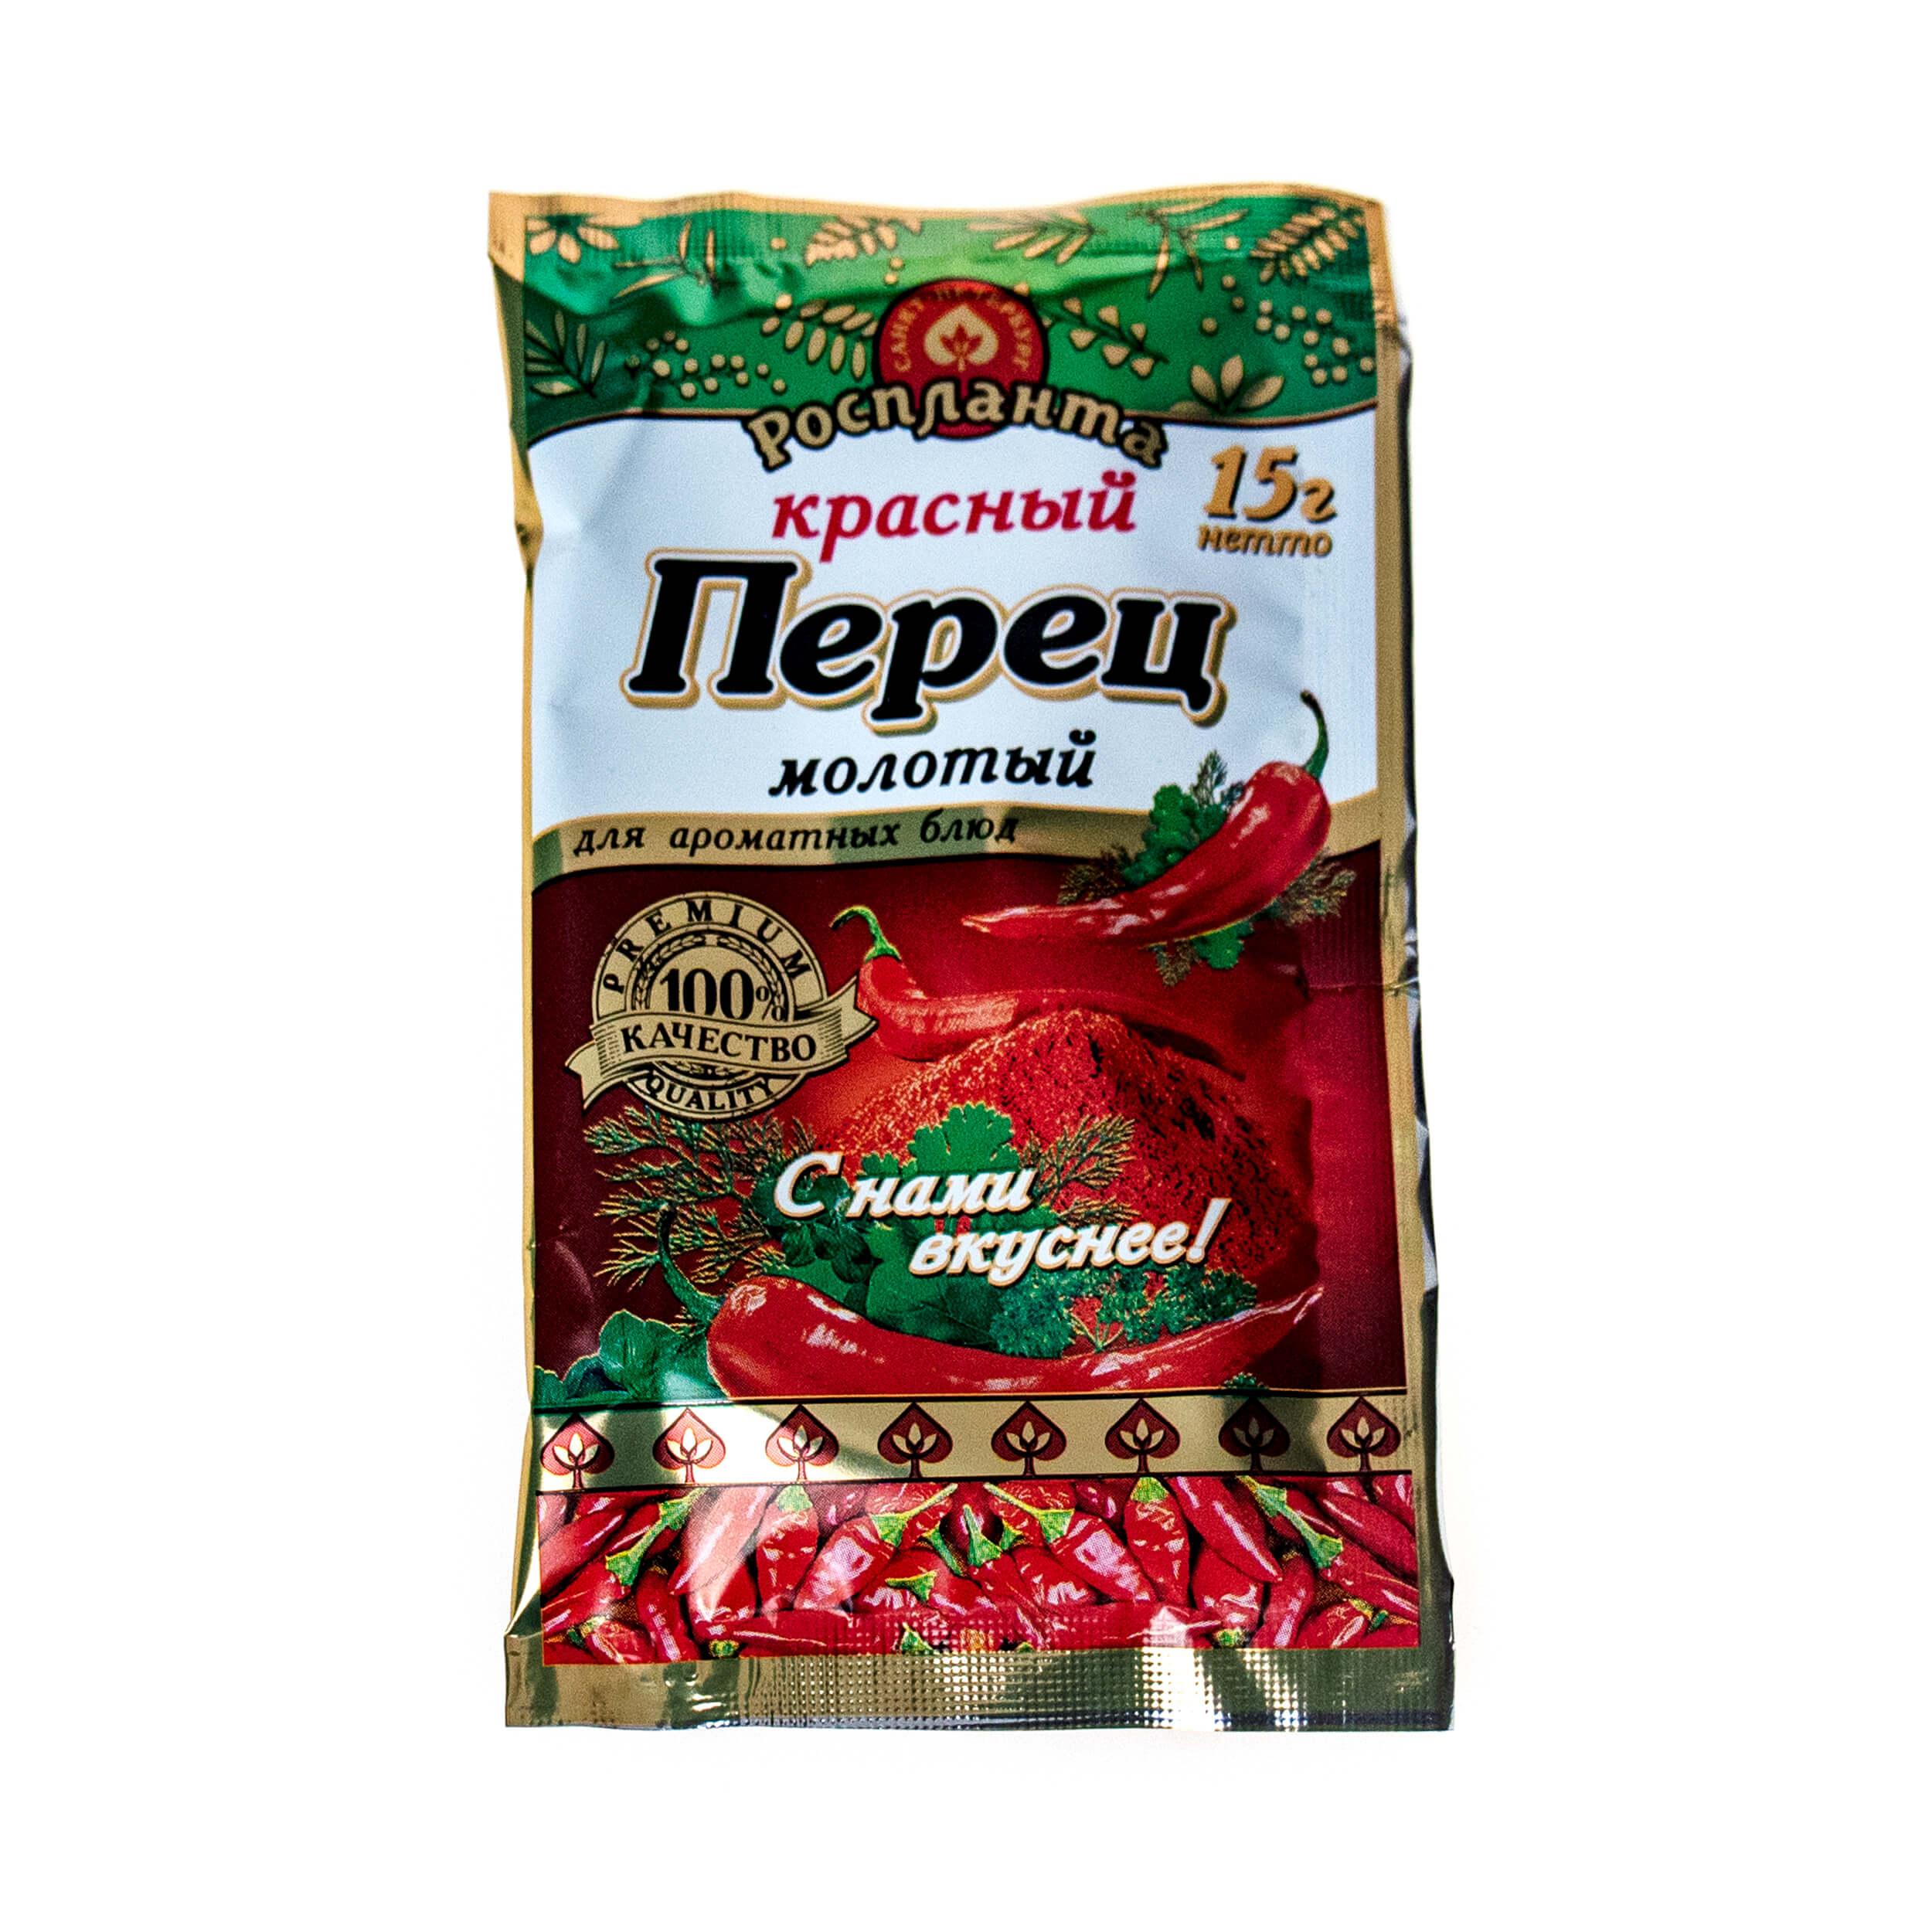 Красный перец молотый для пчел (15 гр) фото